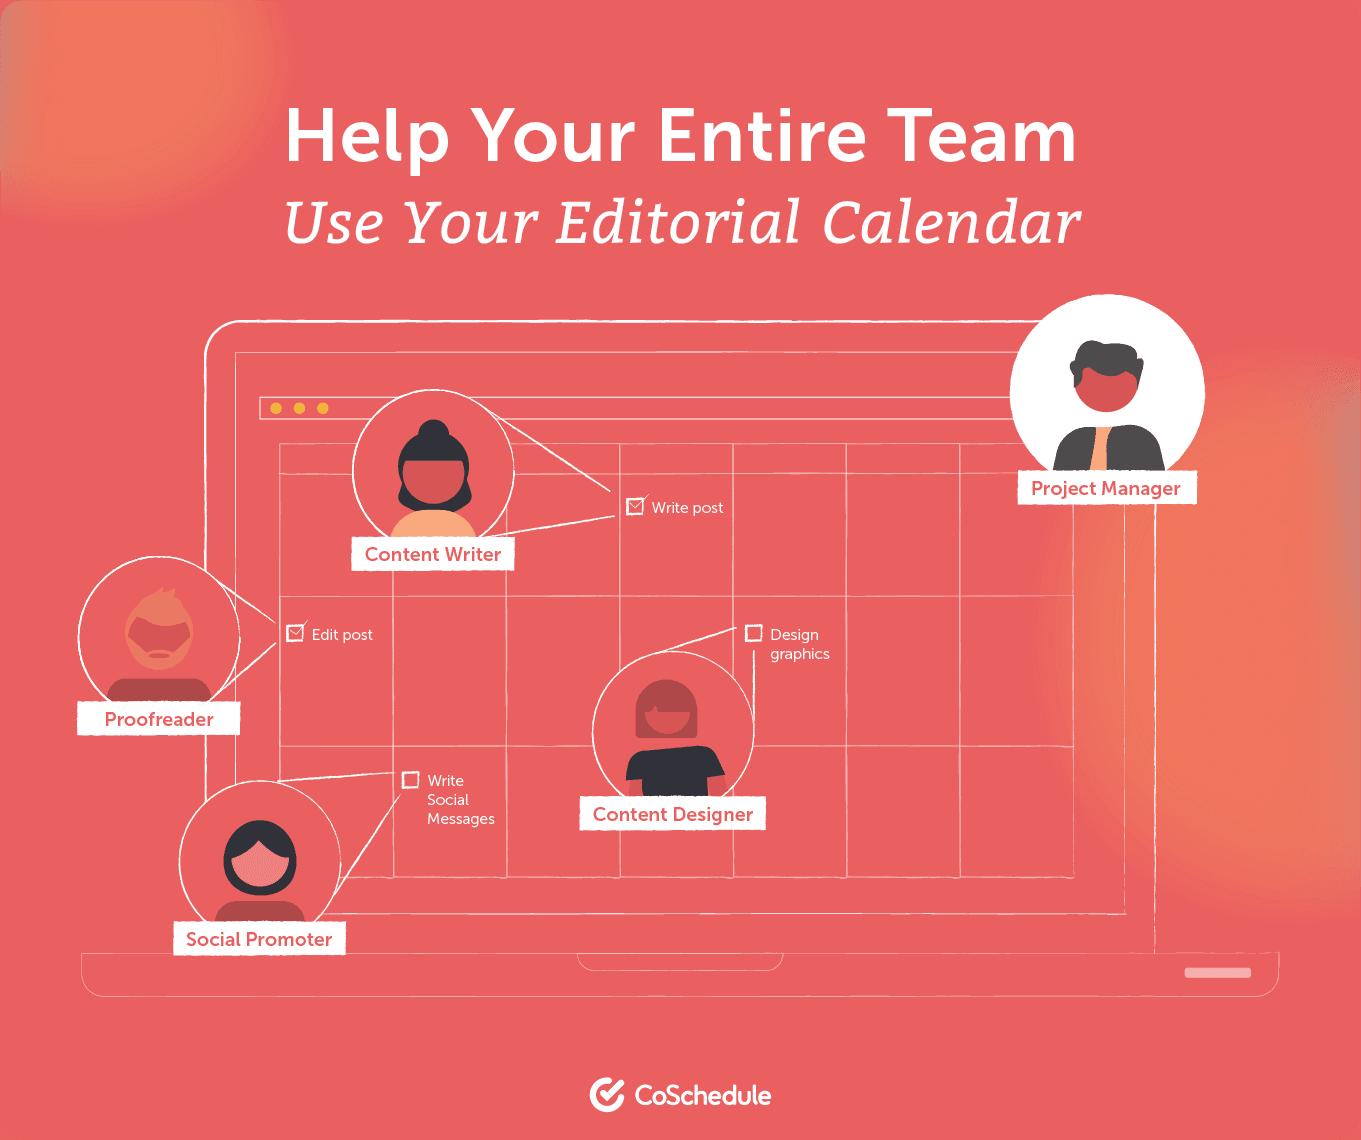 Help your team use your editorial calendar